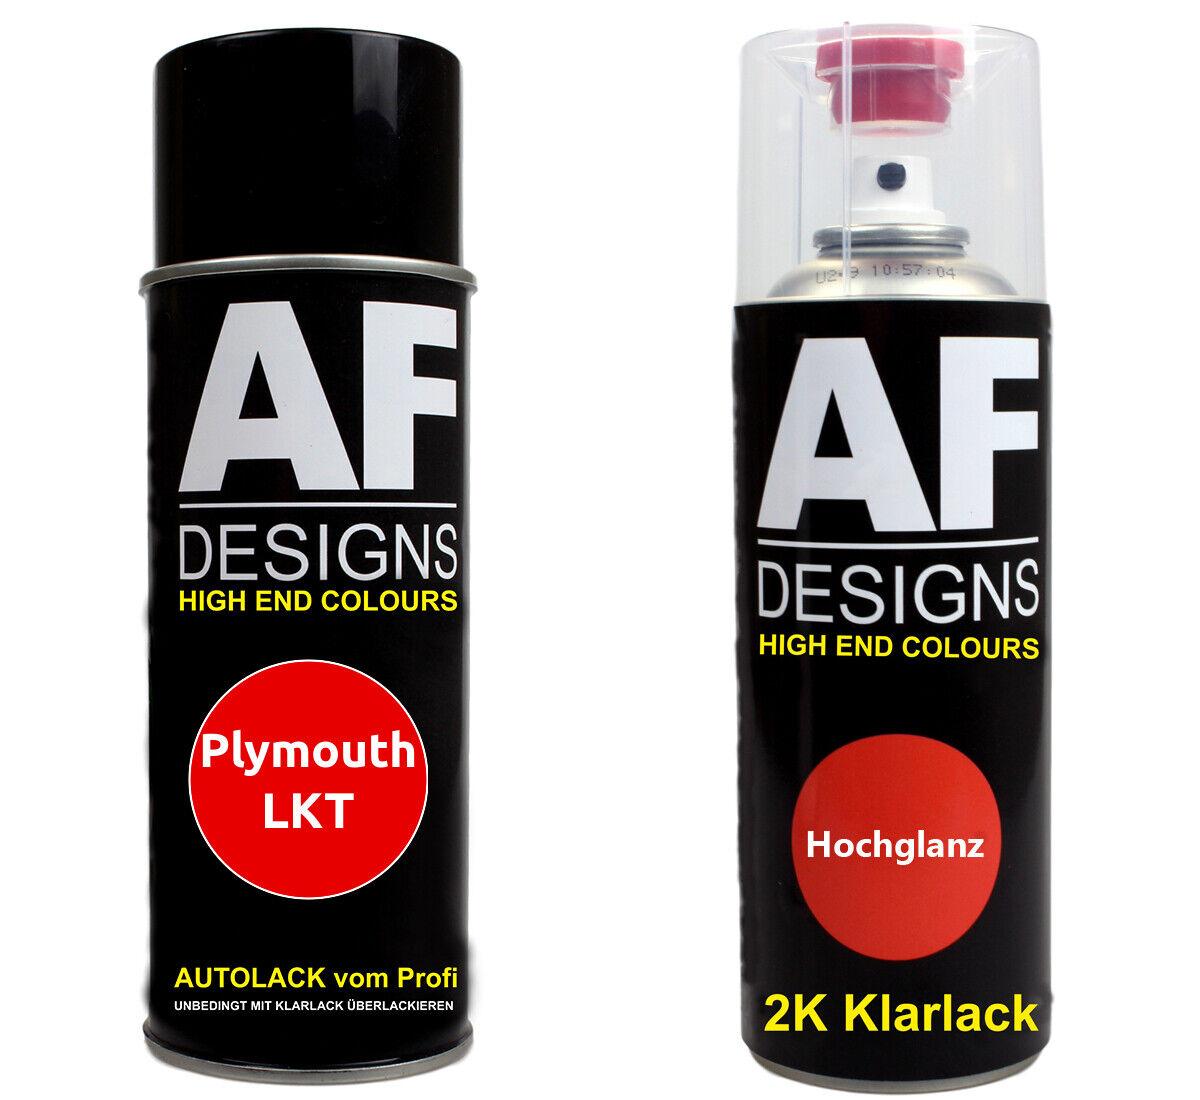 Autolack Spraydose Set Plymouth LKT Rock Lobster Basislack 2k Klarlack Sprühdos